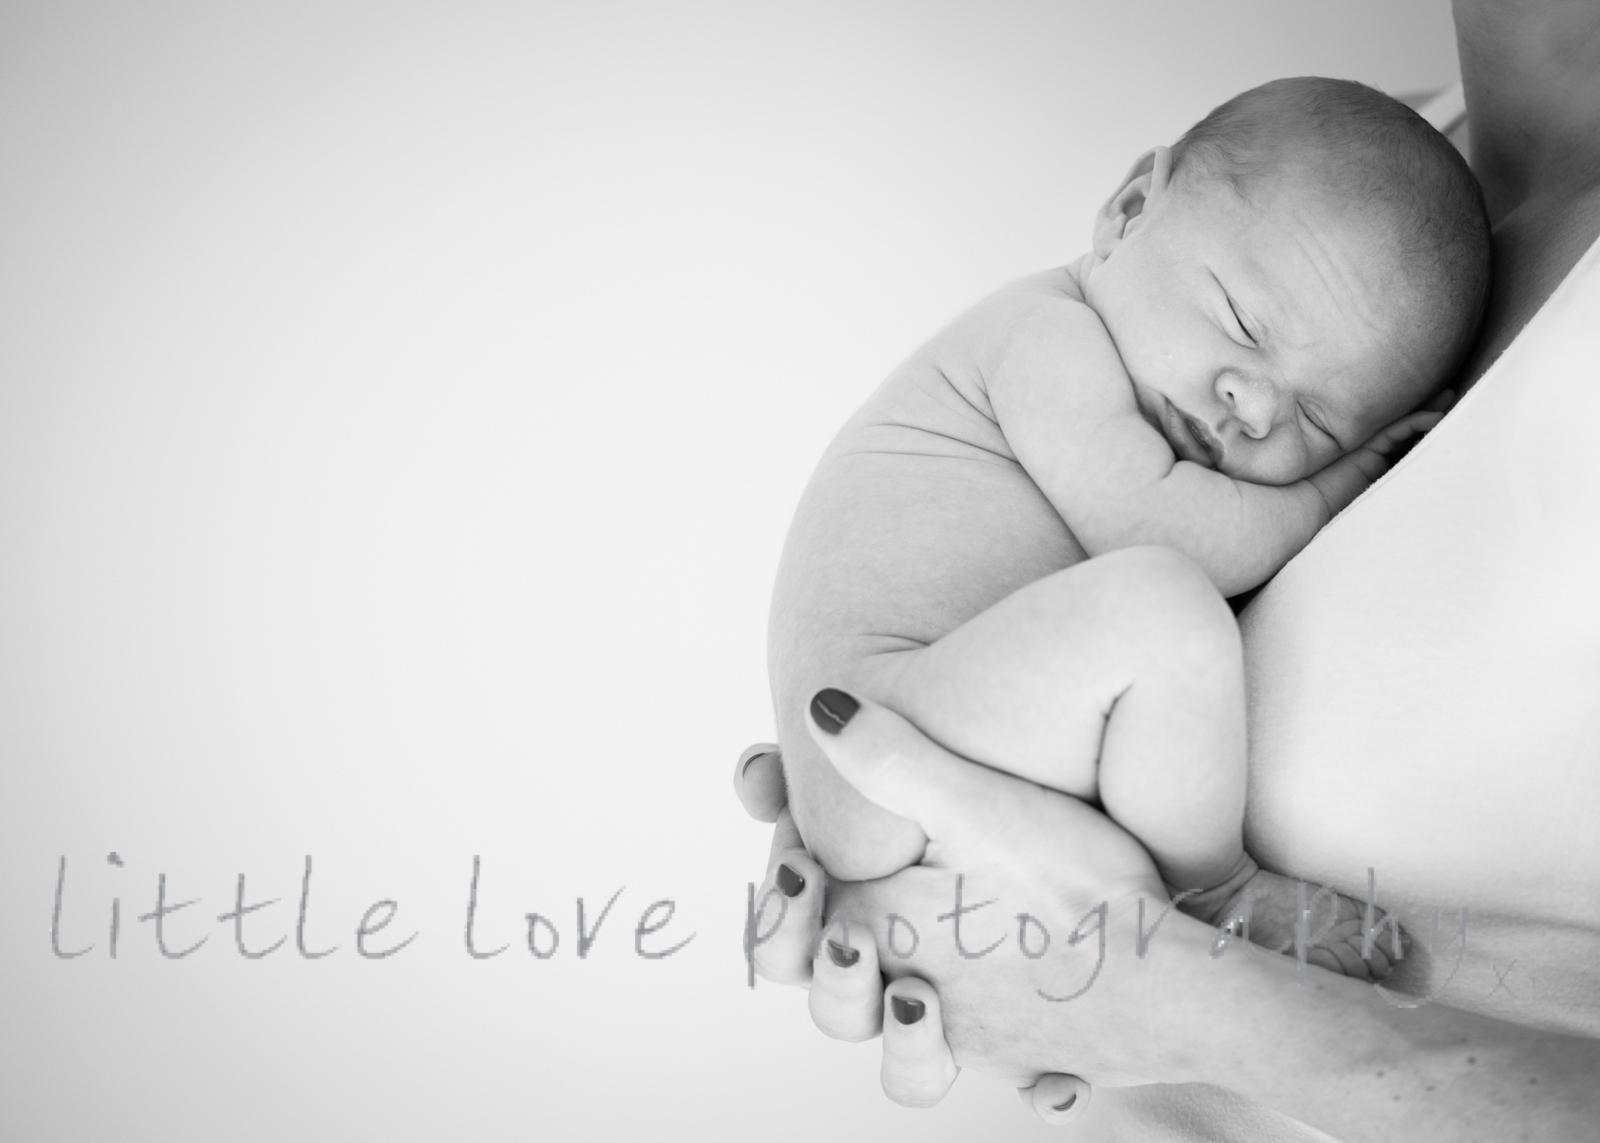 beautiful-image-of-baby-curled-up-sleepy-newborn-photography-sydney